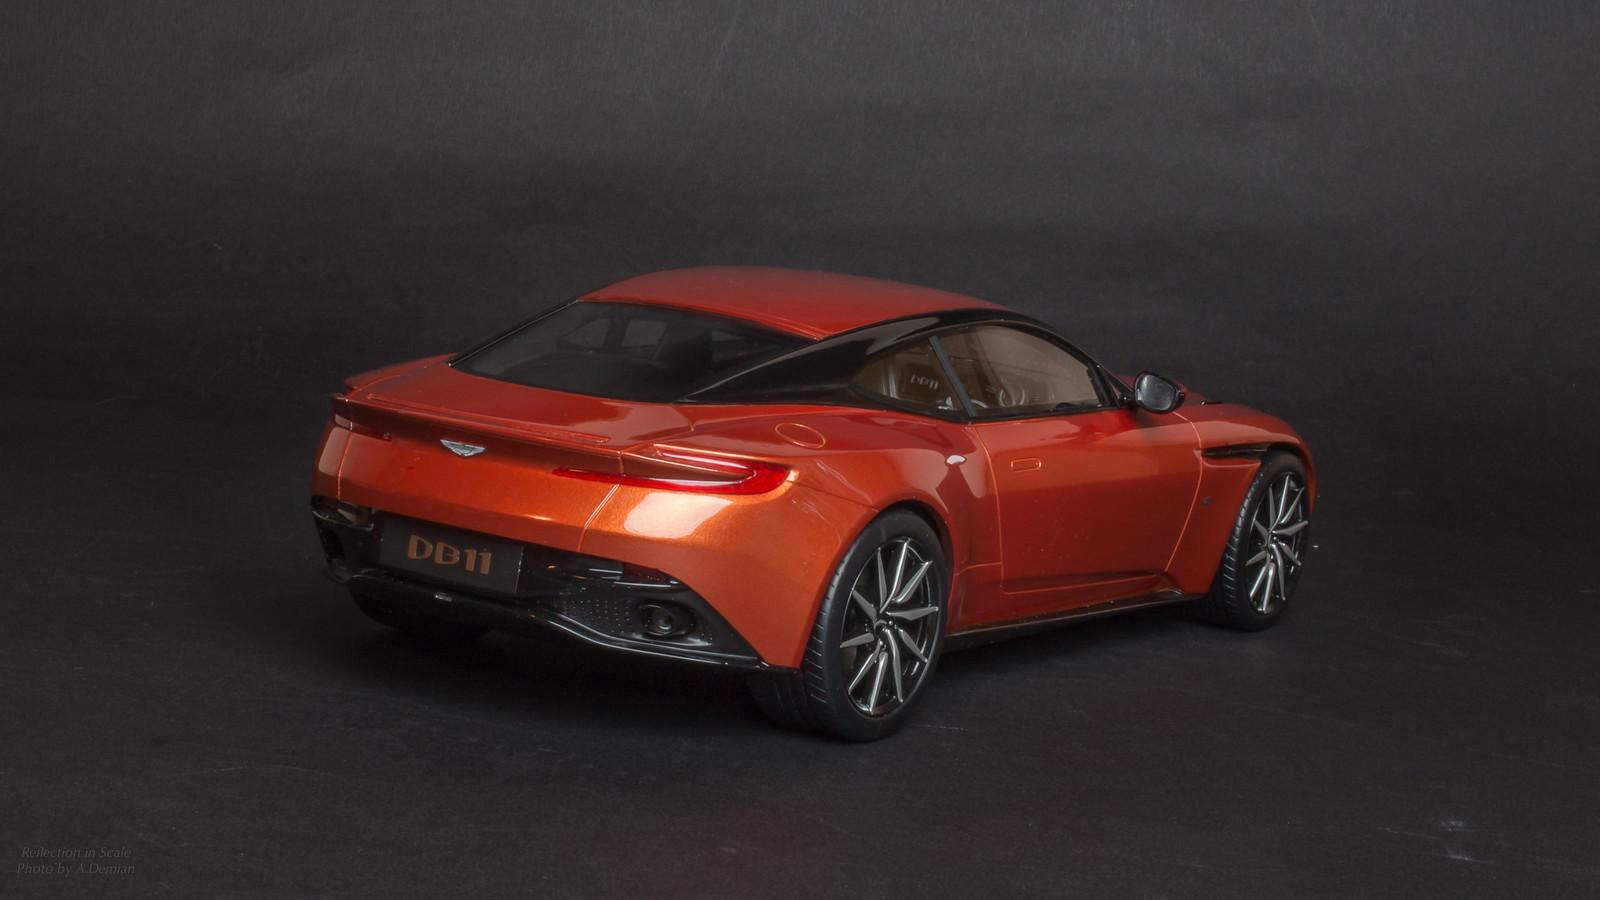 1 18 aston martin db11 by topspeed tsm aston martin diecast cars forums. Black Bedroom Furniture Sets. Home Design Ideas